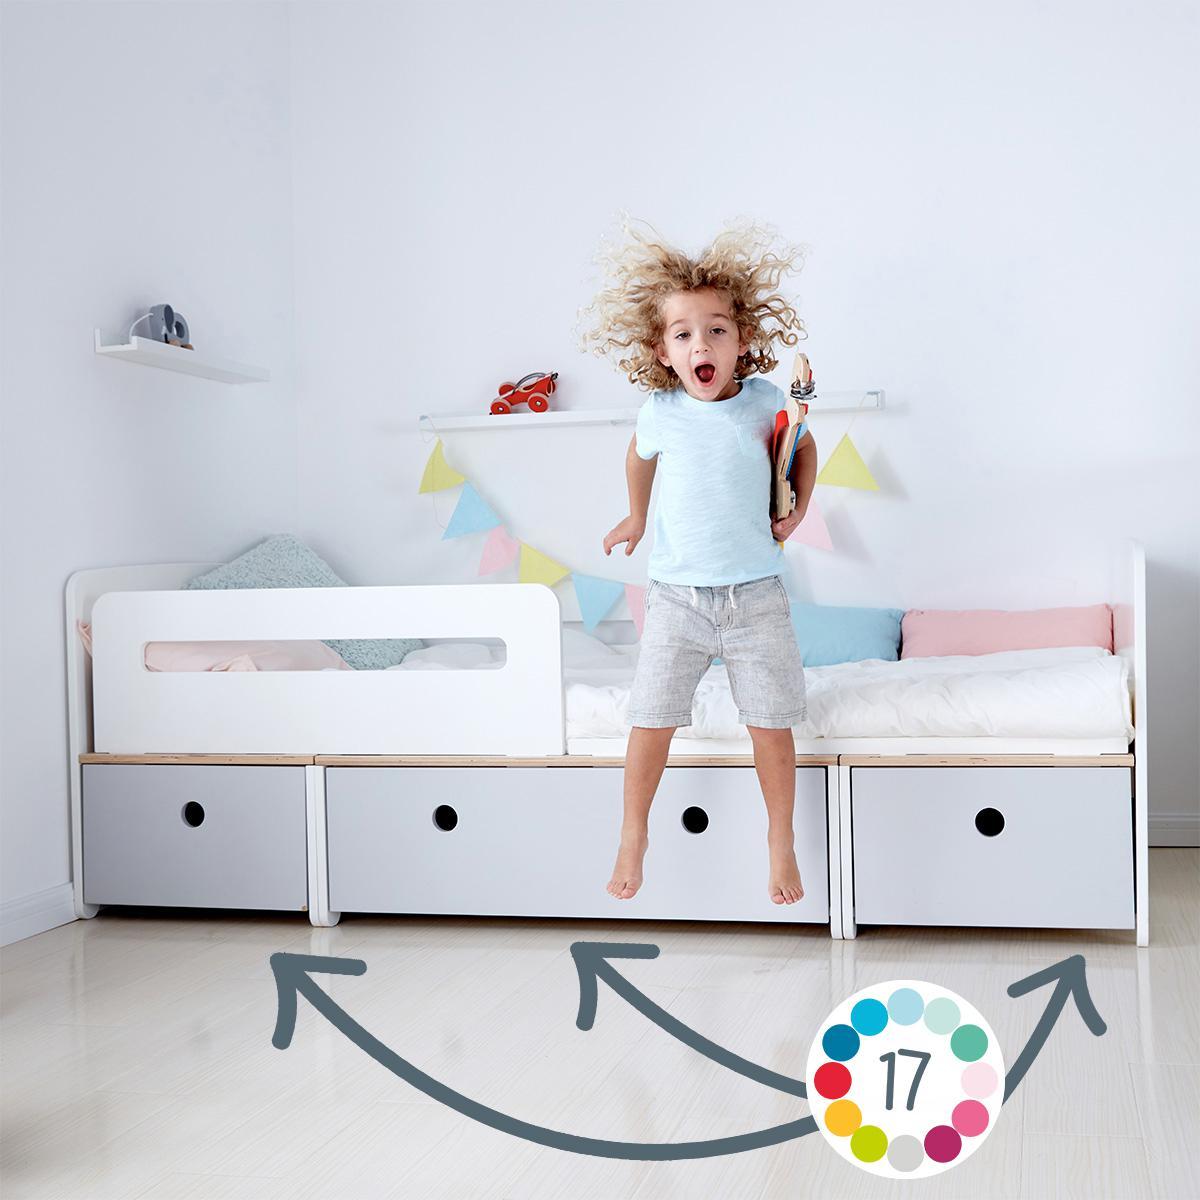 Kinderbett 90x200cm COLORFLEX pearl grey-white wash-pearl grey